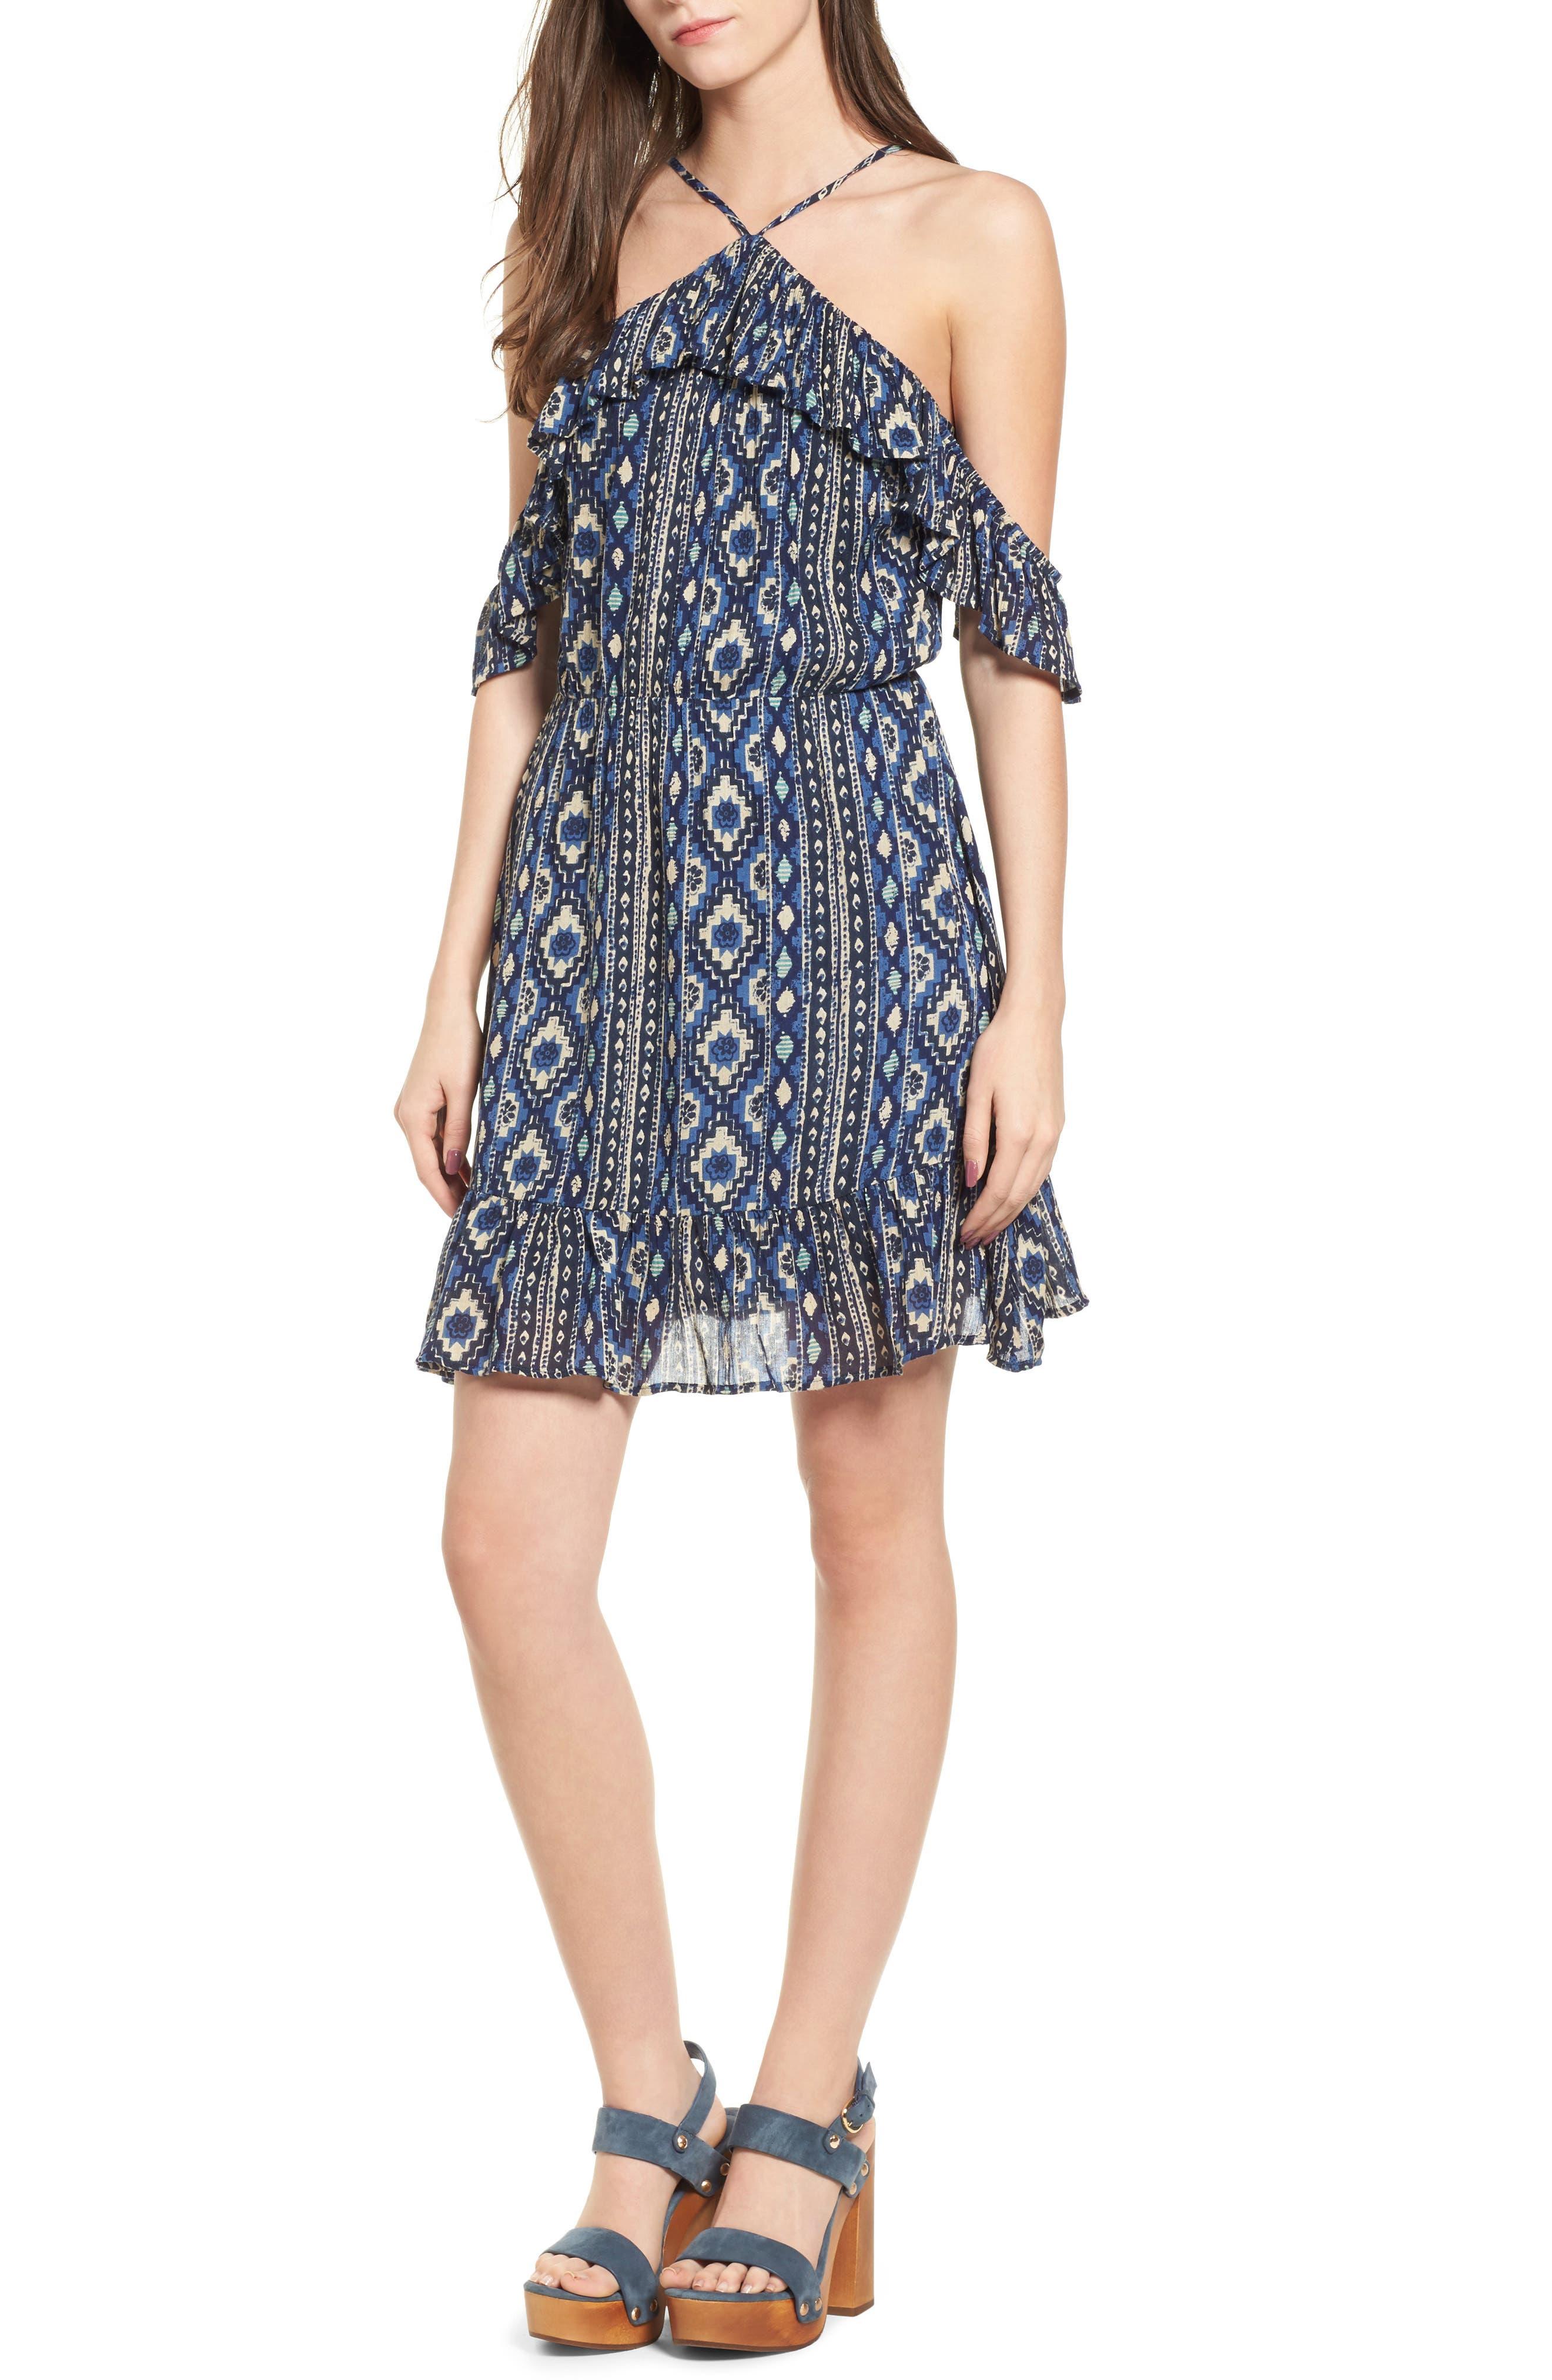 Cancun Ruffle Halter Dress,                         Main,                         color, Multi Blue